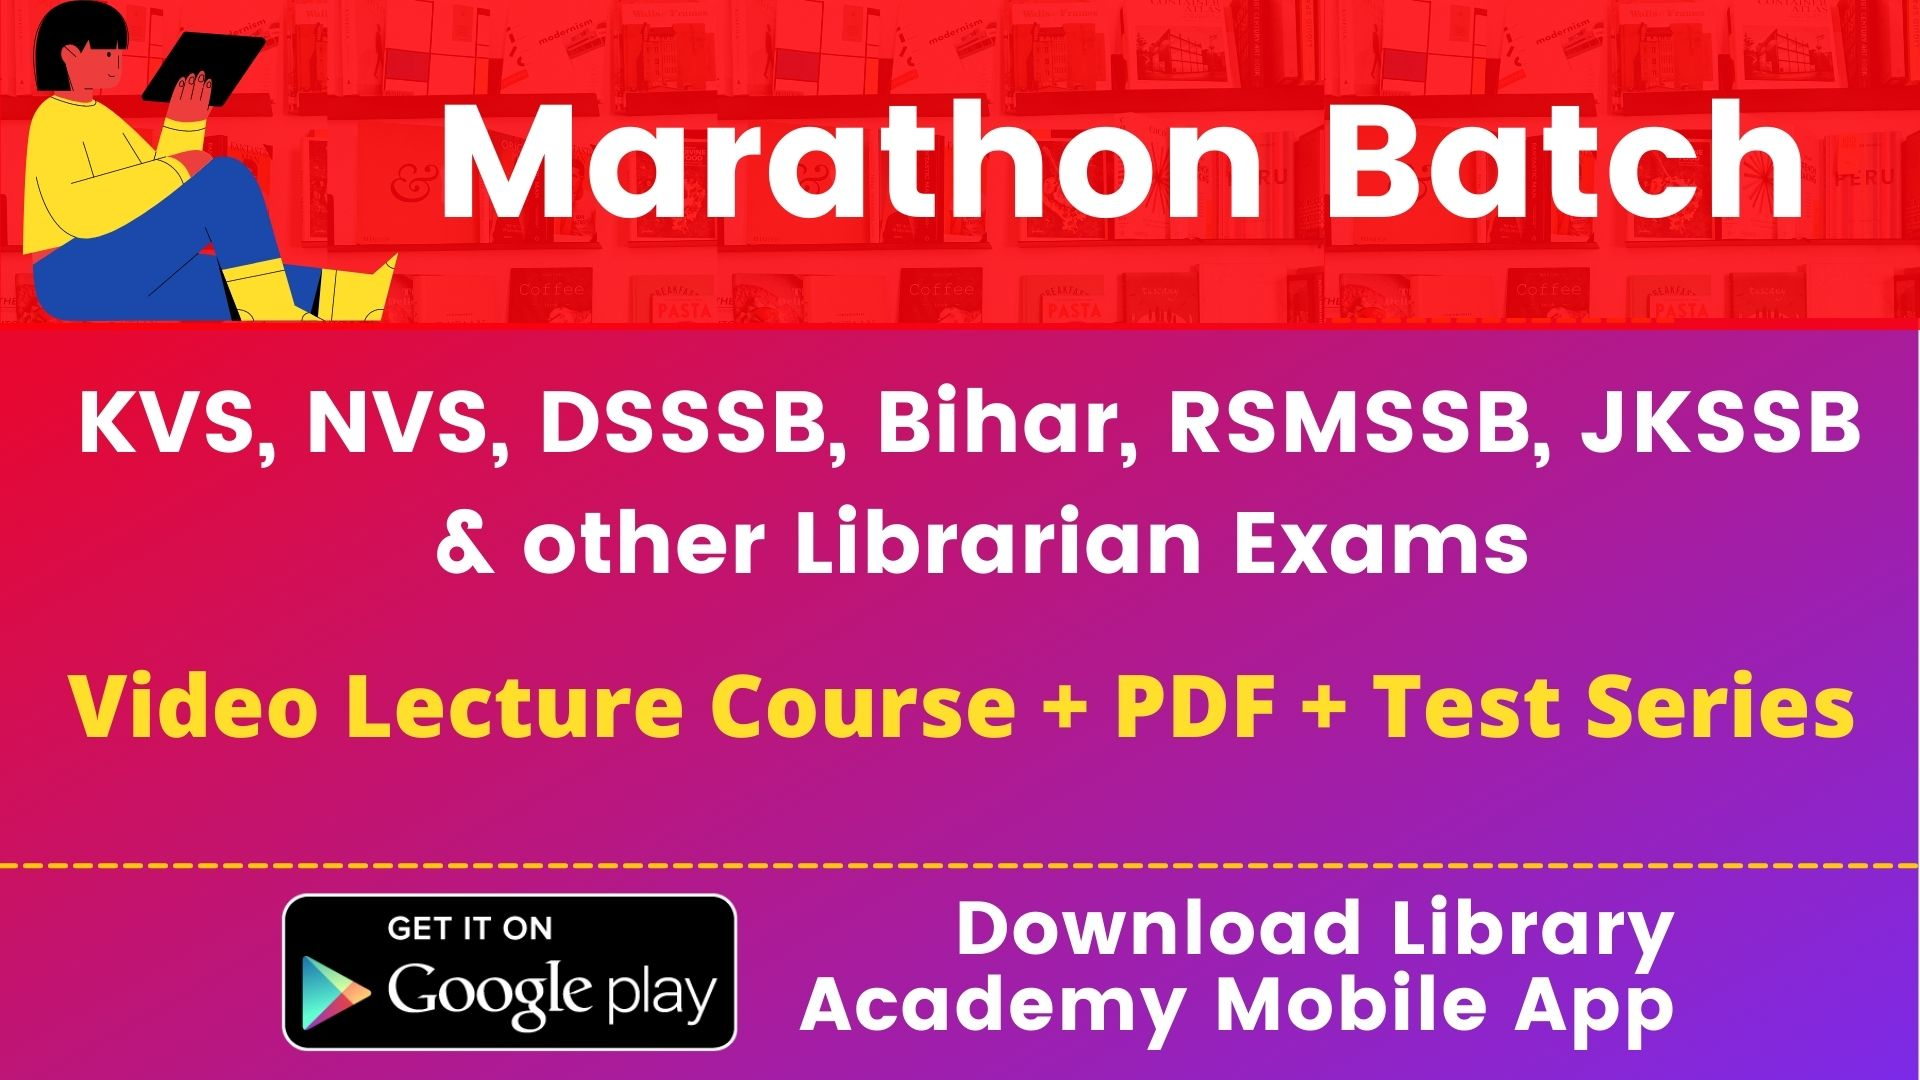 Library Academy App